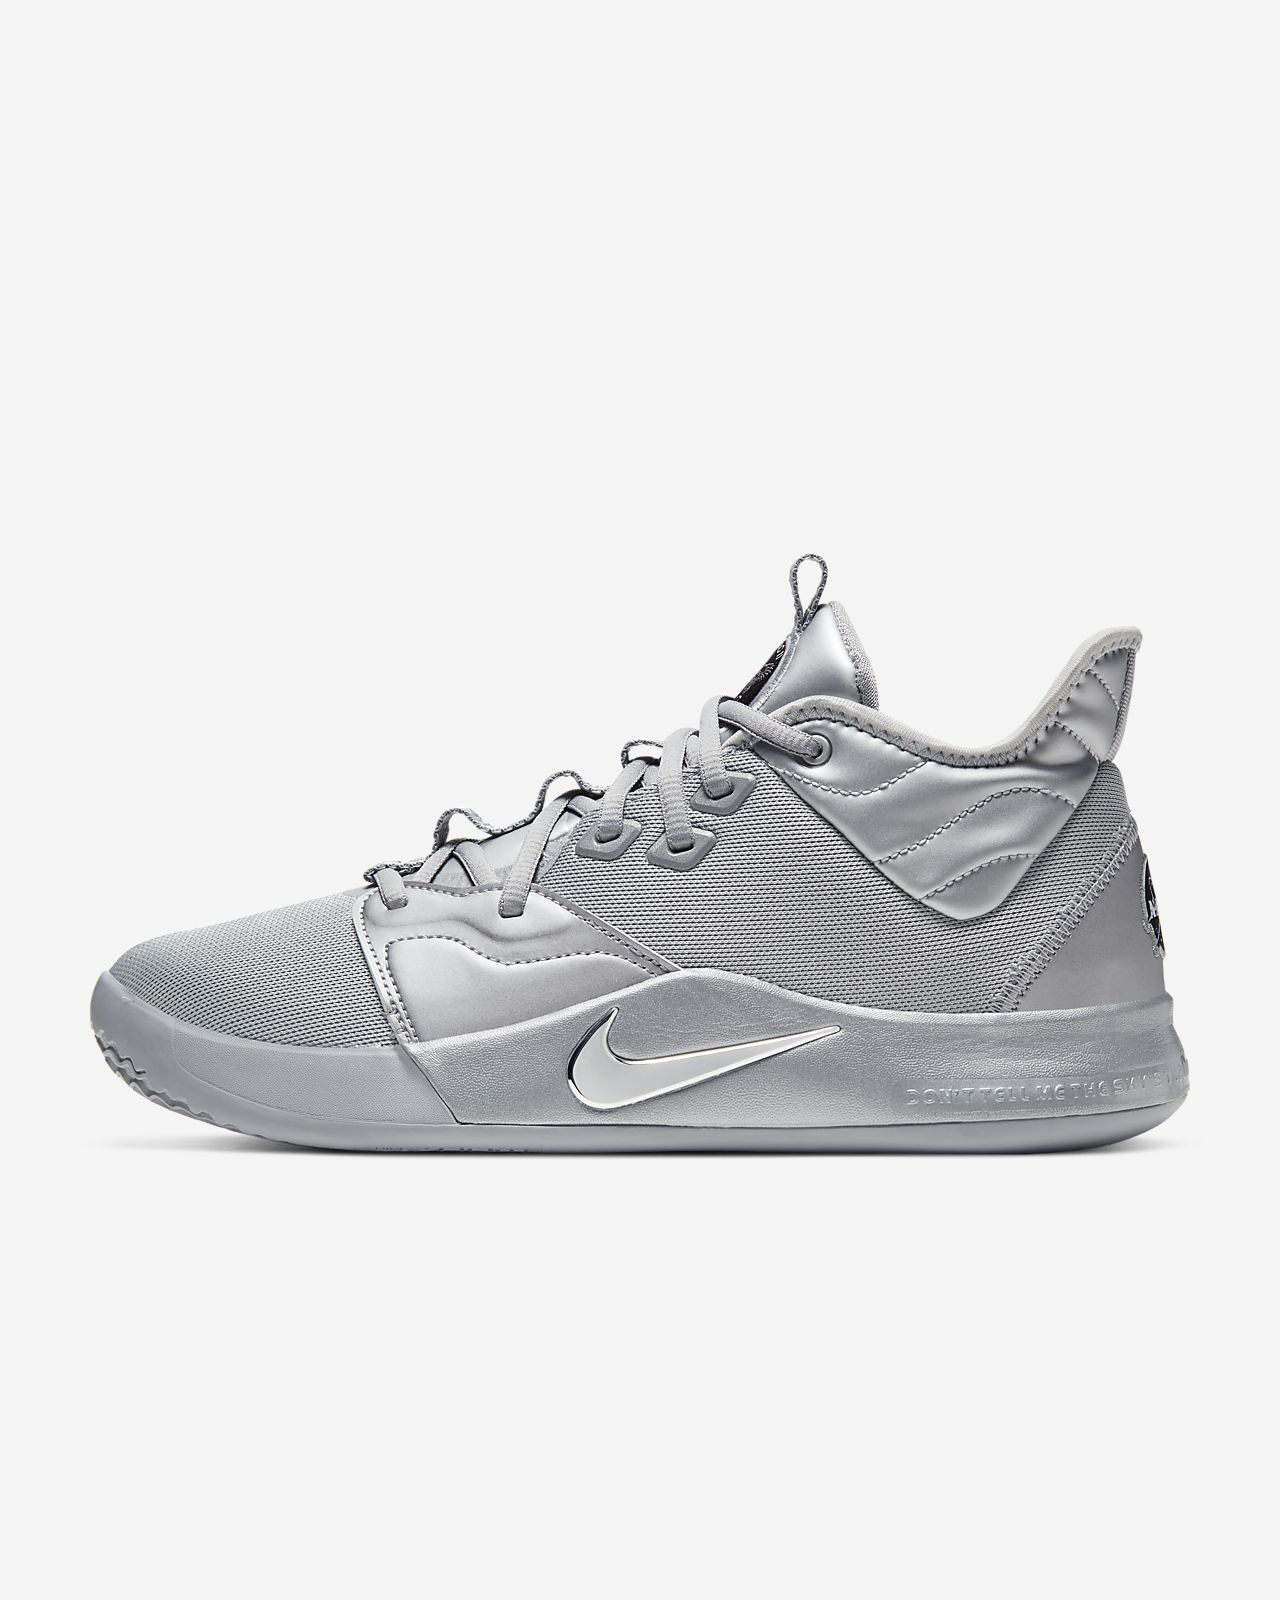 comprare popolare vende miglior sito PG 3 NASA EP Basketball Shoe. Nike PH